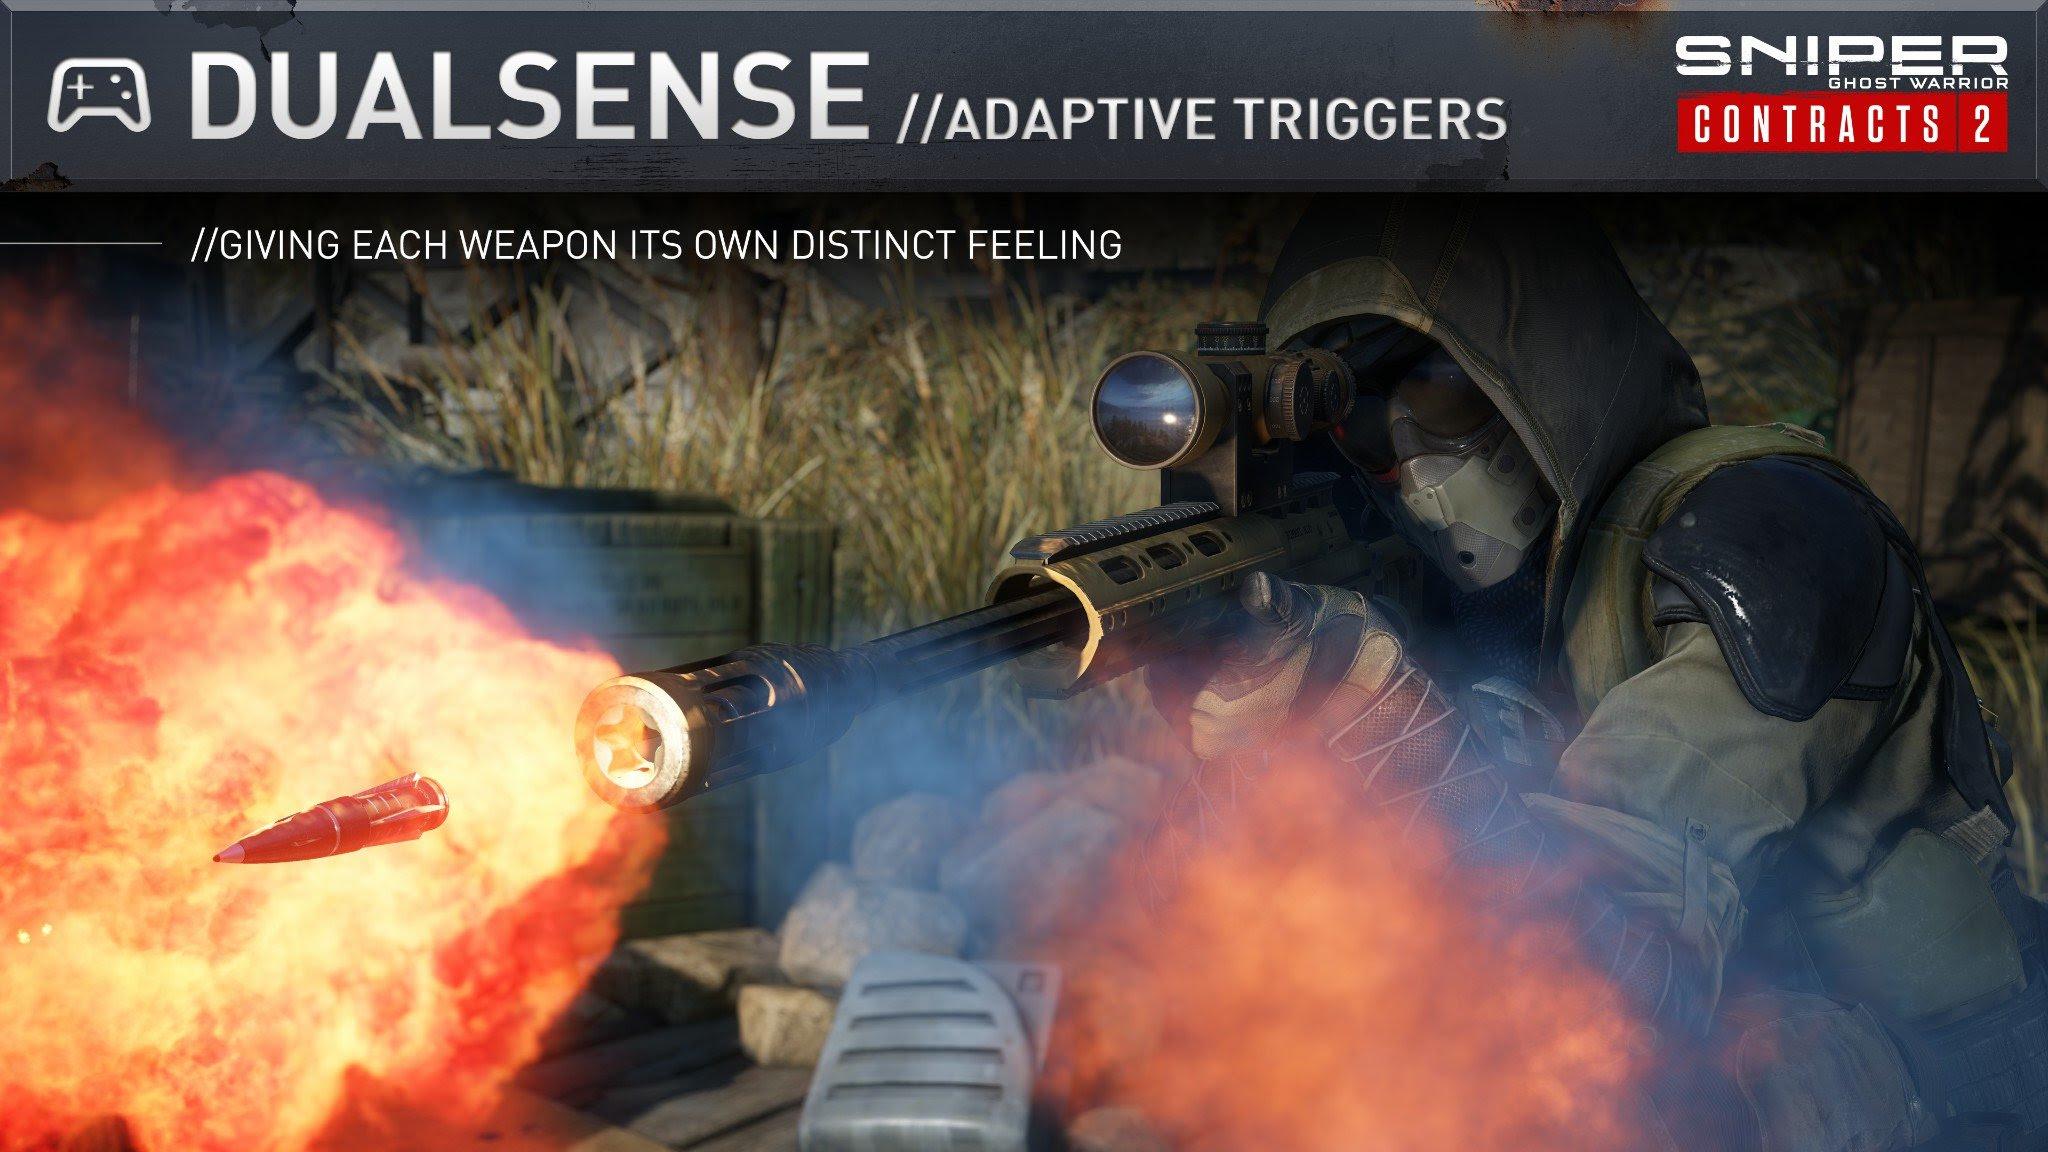 Sniper Ghost Warrior 2382021 2